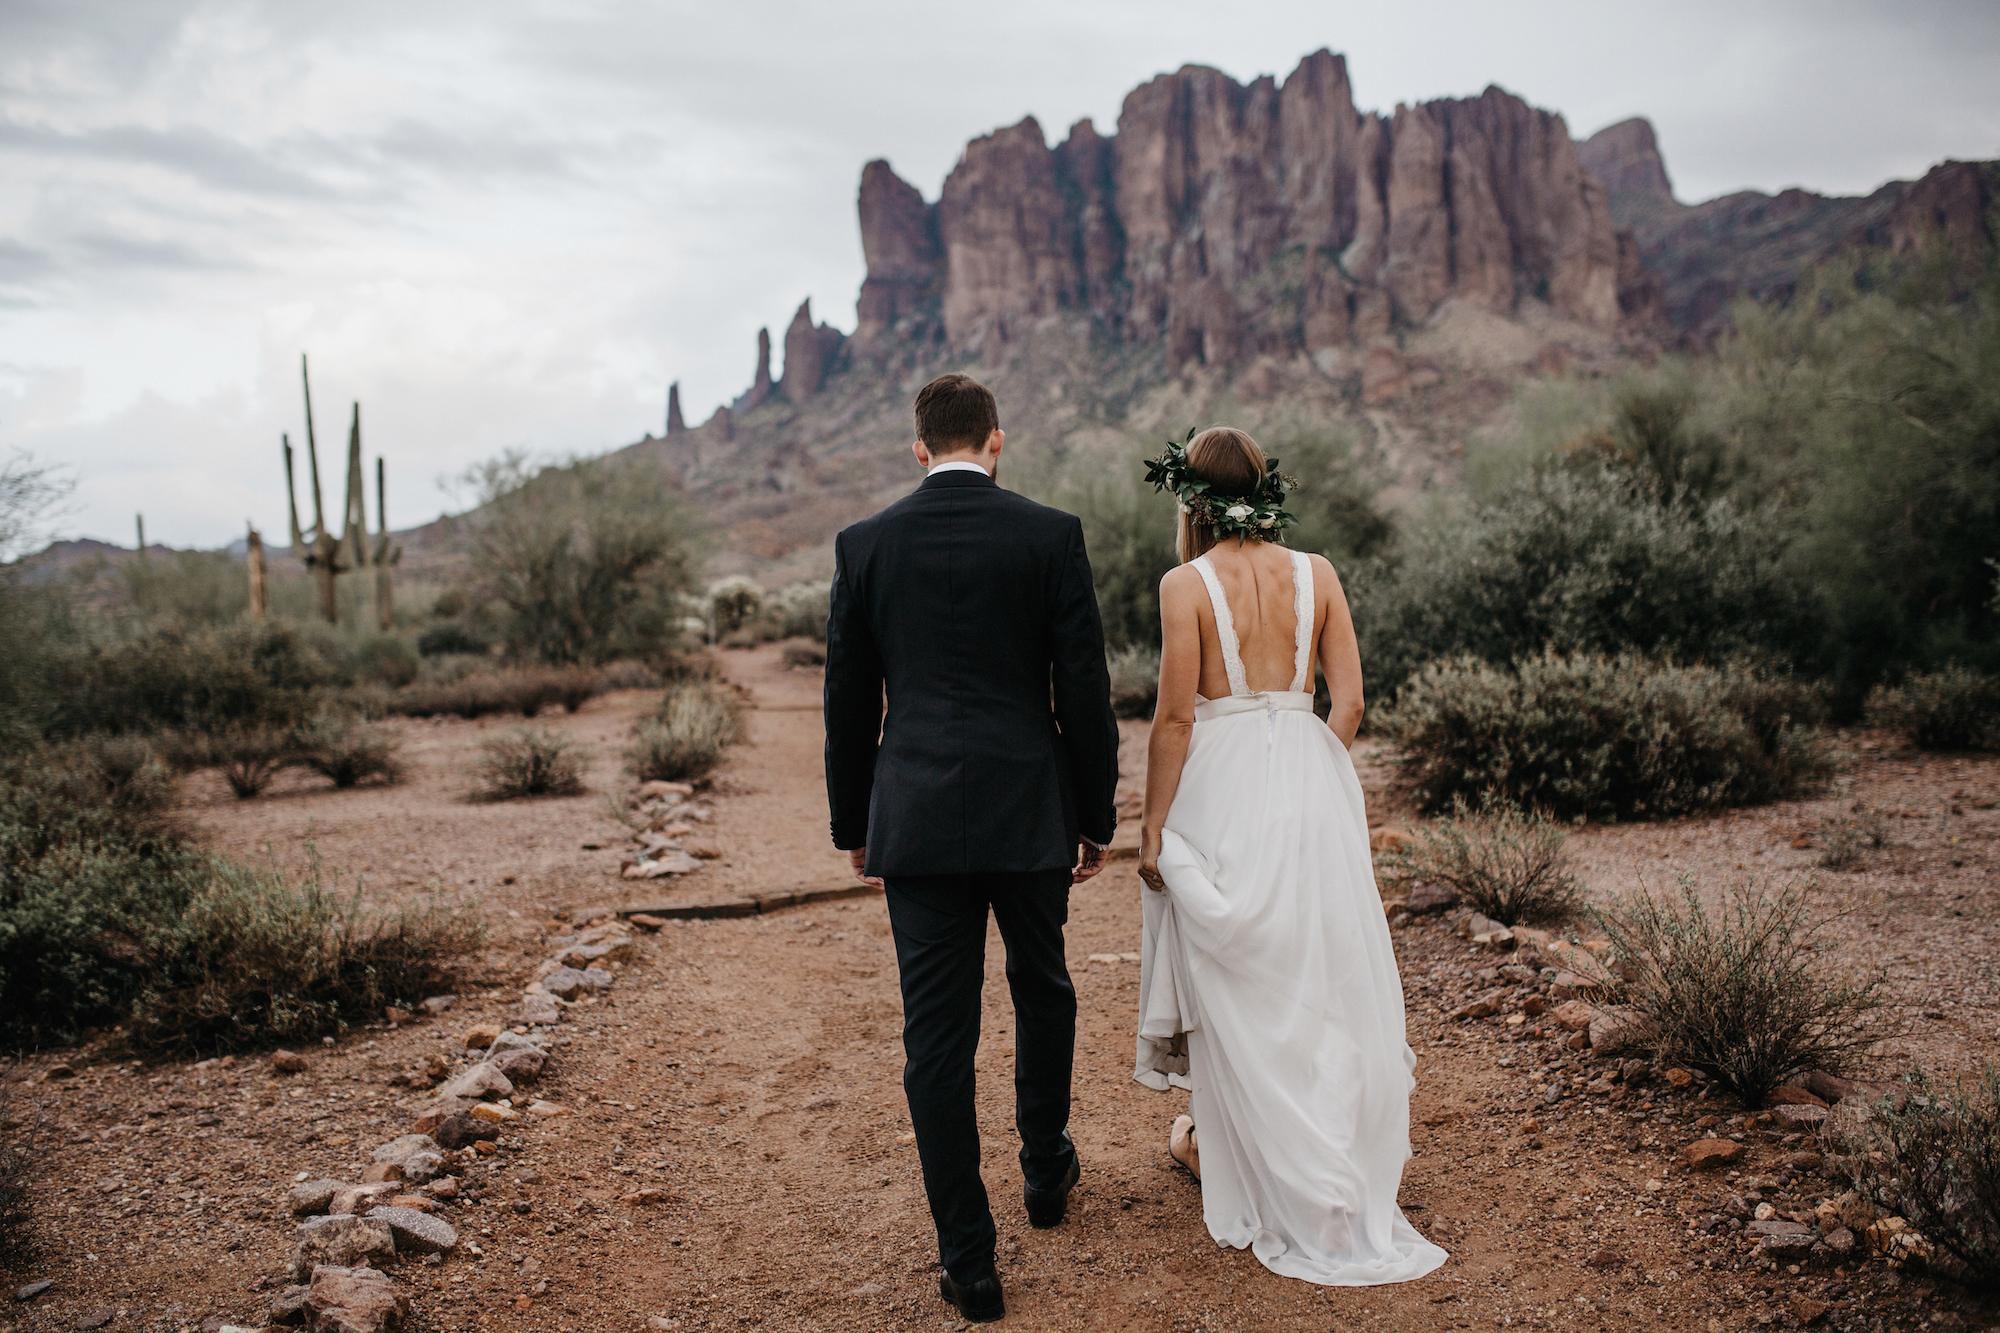 arizona - wedding - photographer760.jpg